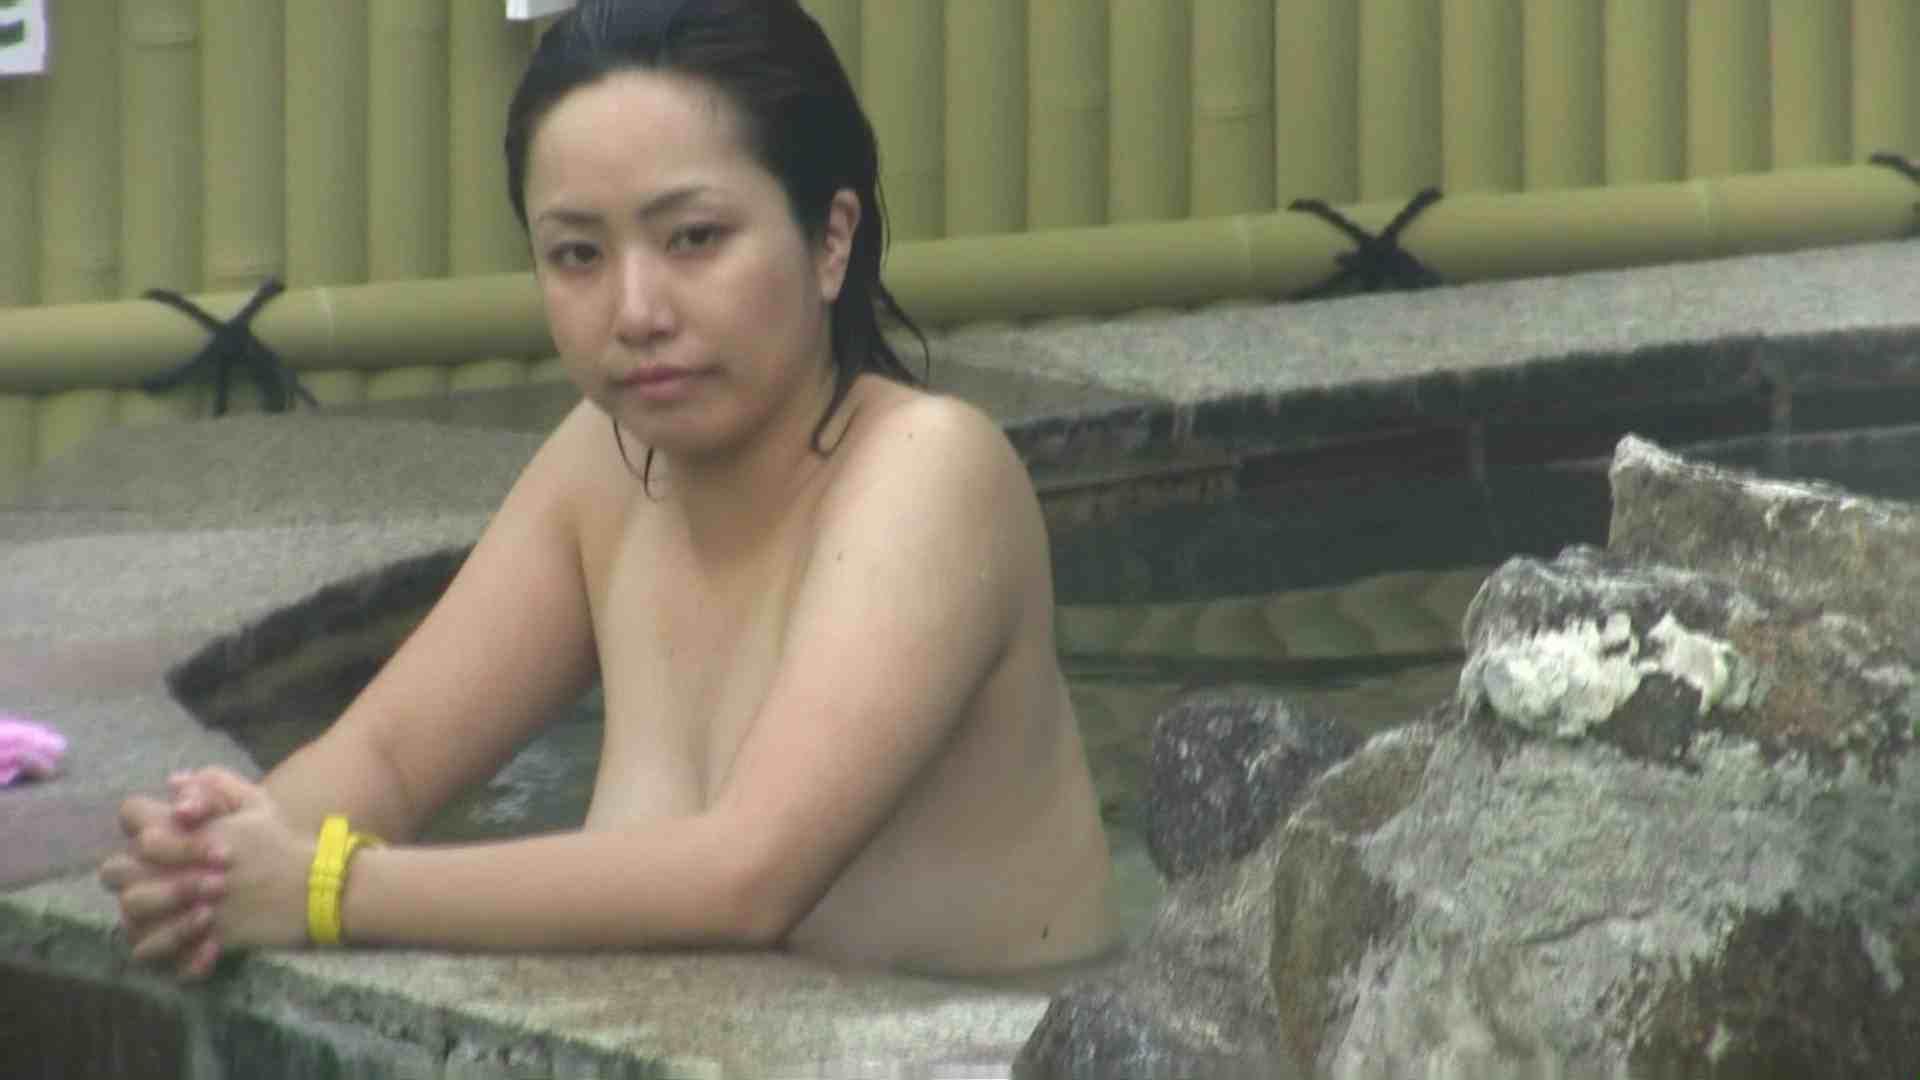 Aquaな露天風呂Vol.604 露天風呂突入   盗撮師作品  78pic 4